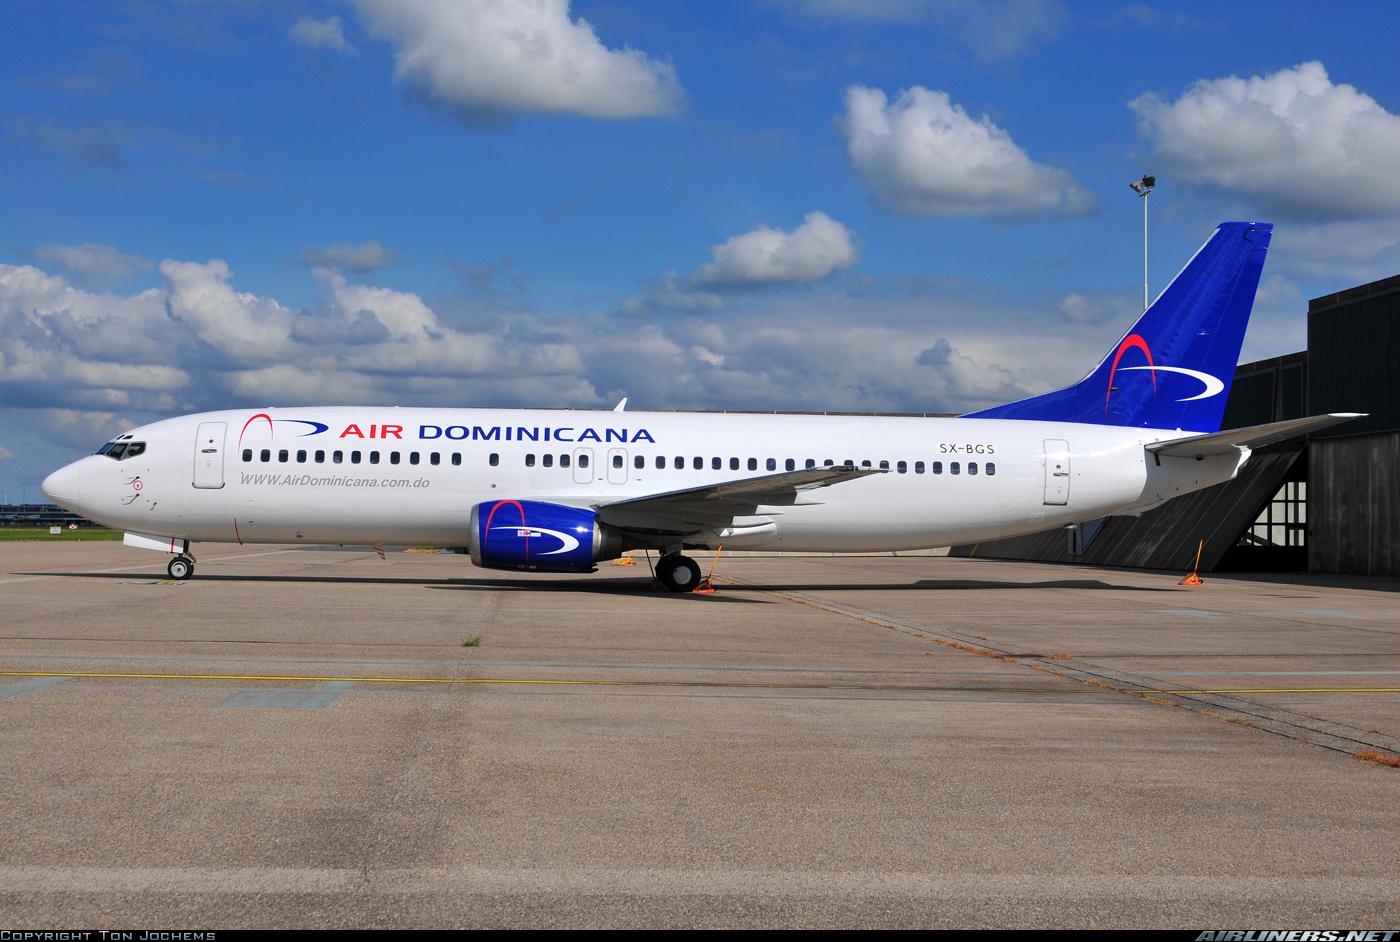 Фото доминиканского самолета